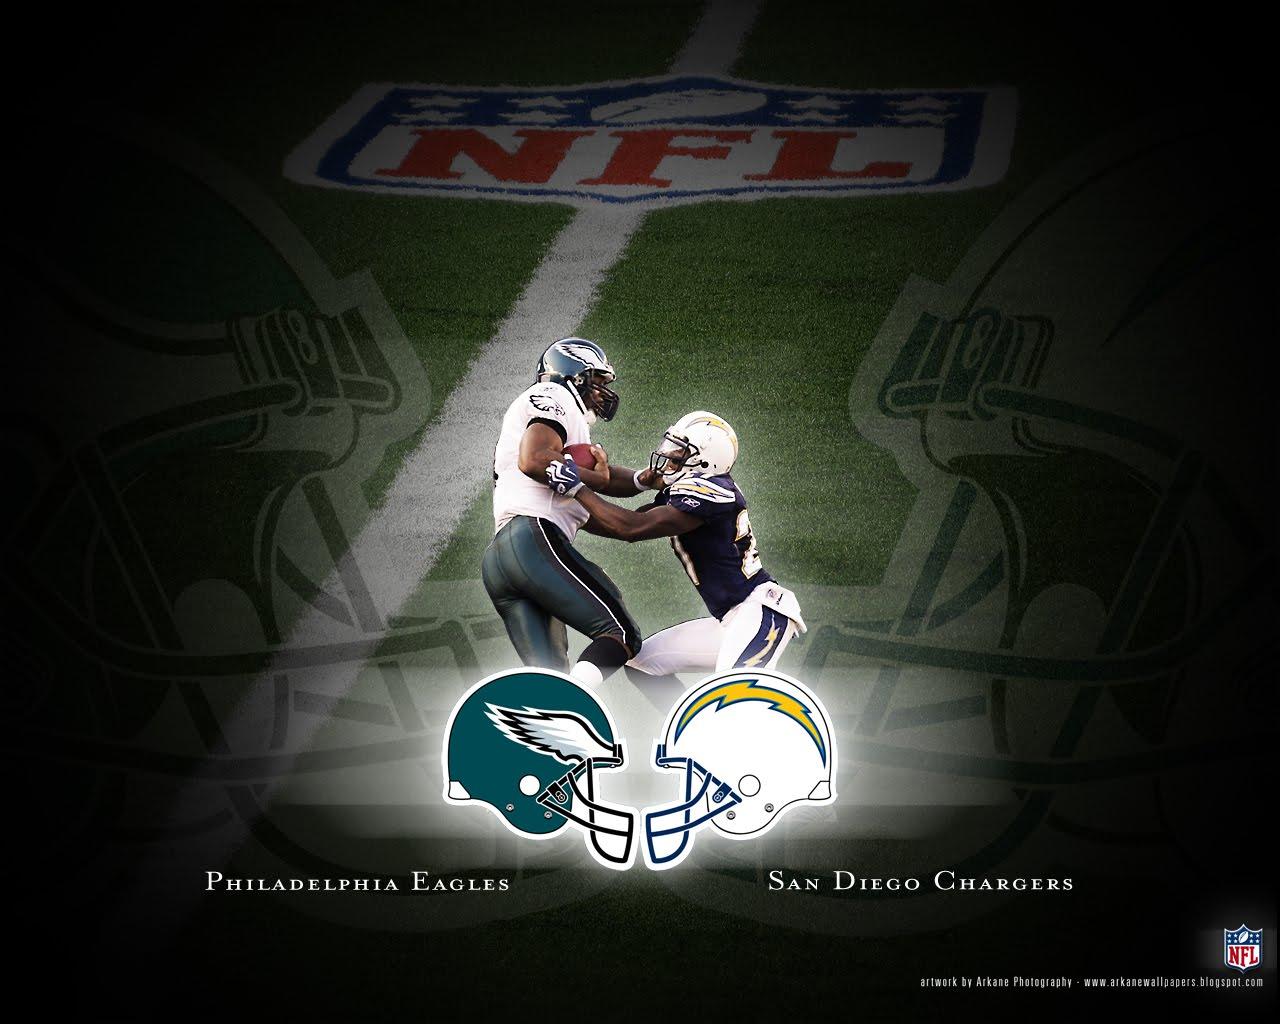 http://2.bp.blogspot.com/_JuYYGgmnUQU/SwXO32v_elI/AAAAAAAAAeY/4J0SCH7sSdI/s1600/Battle10-Eagles-Chargers.jpeg